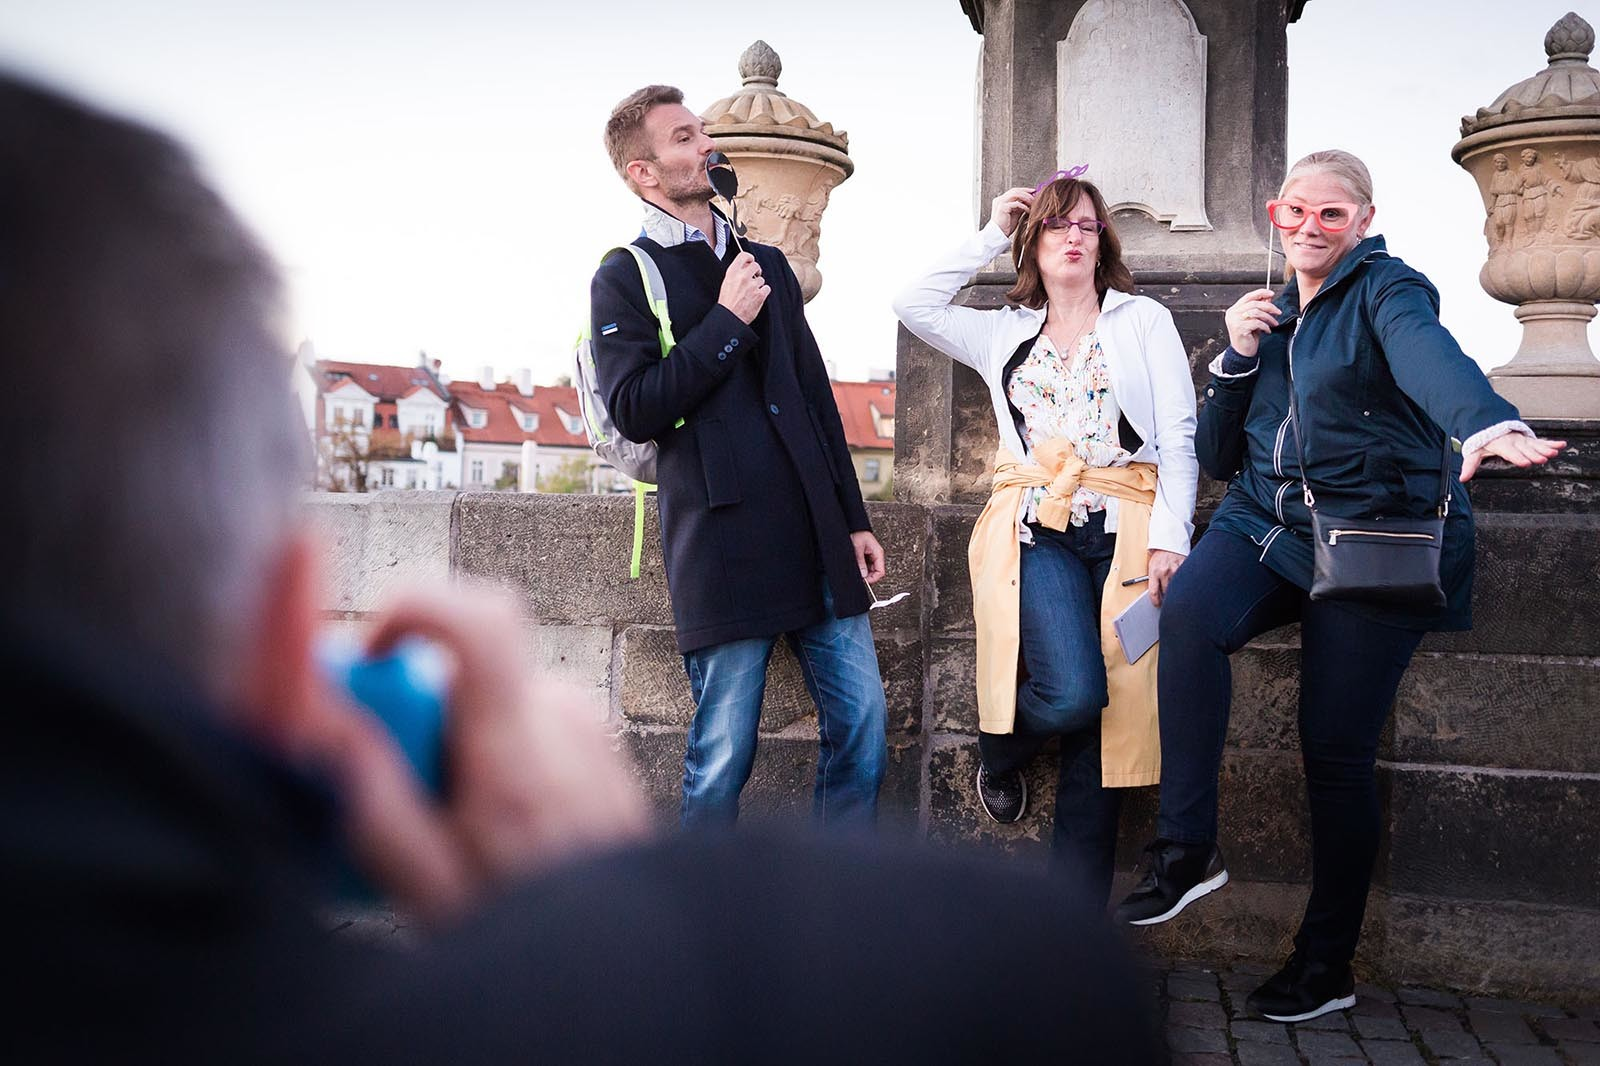 Team plni photo ukol na Karlove mostu ve hre Photopoly